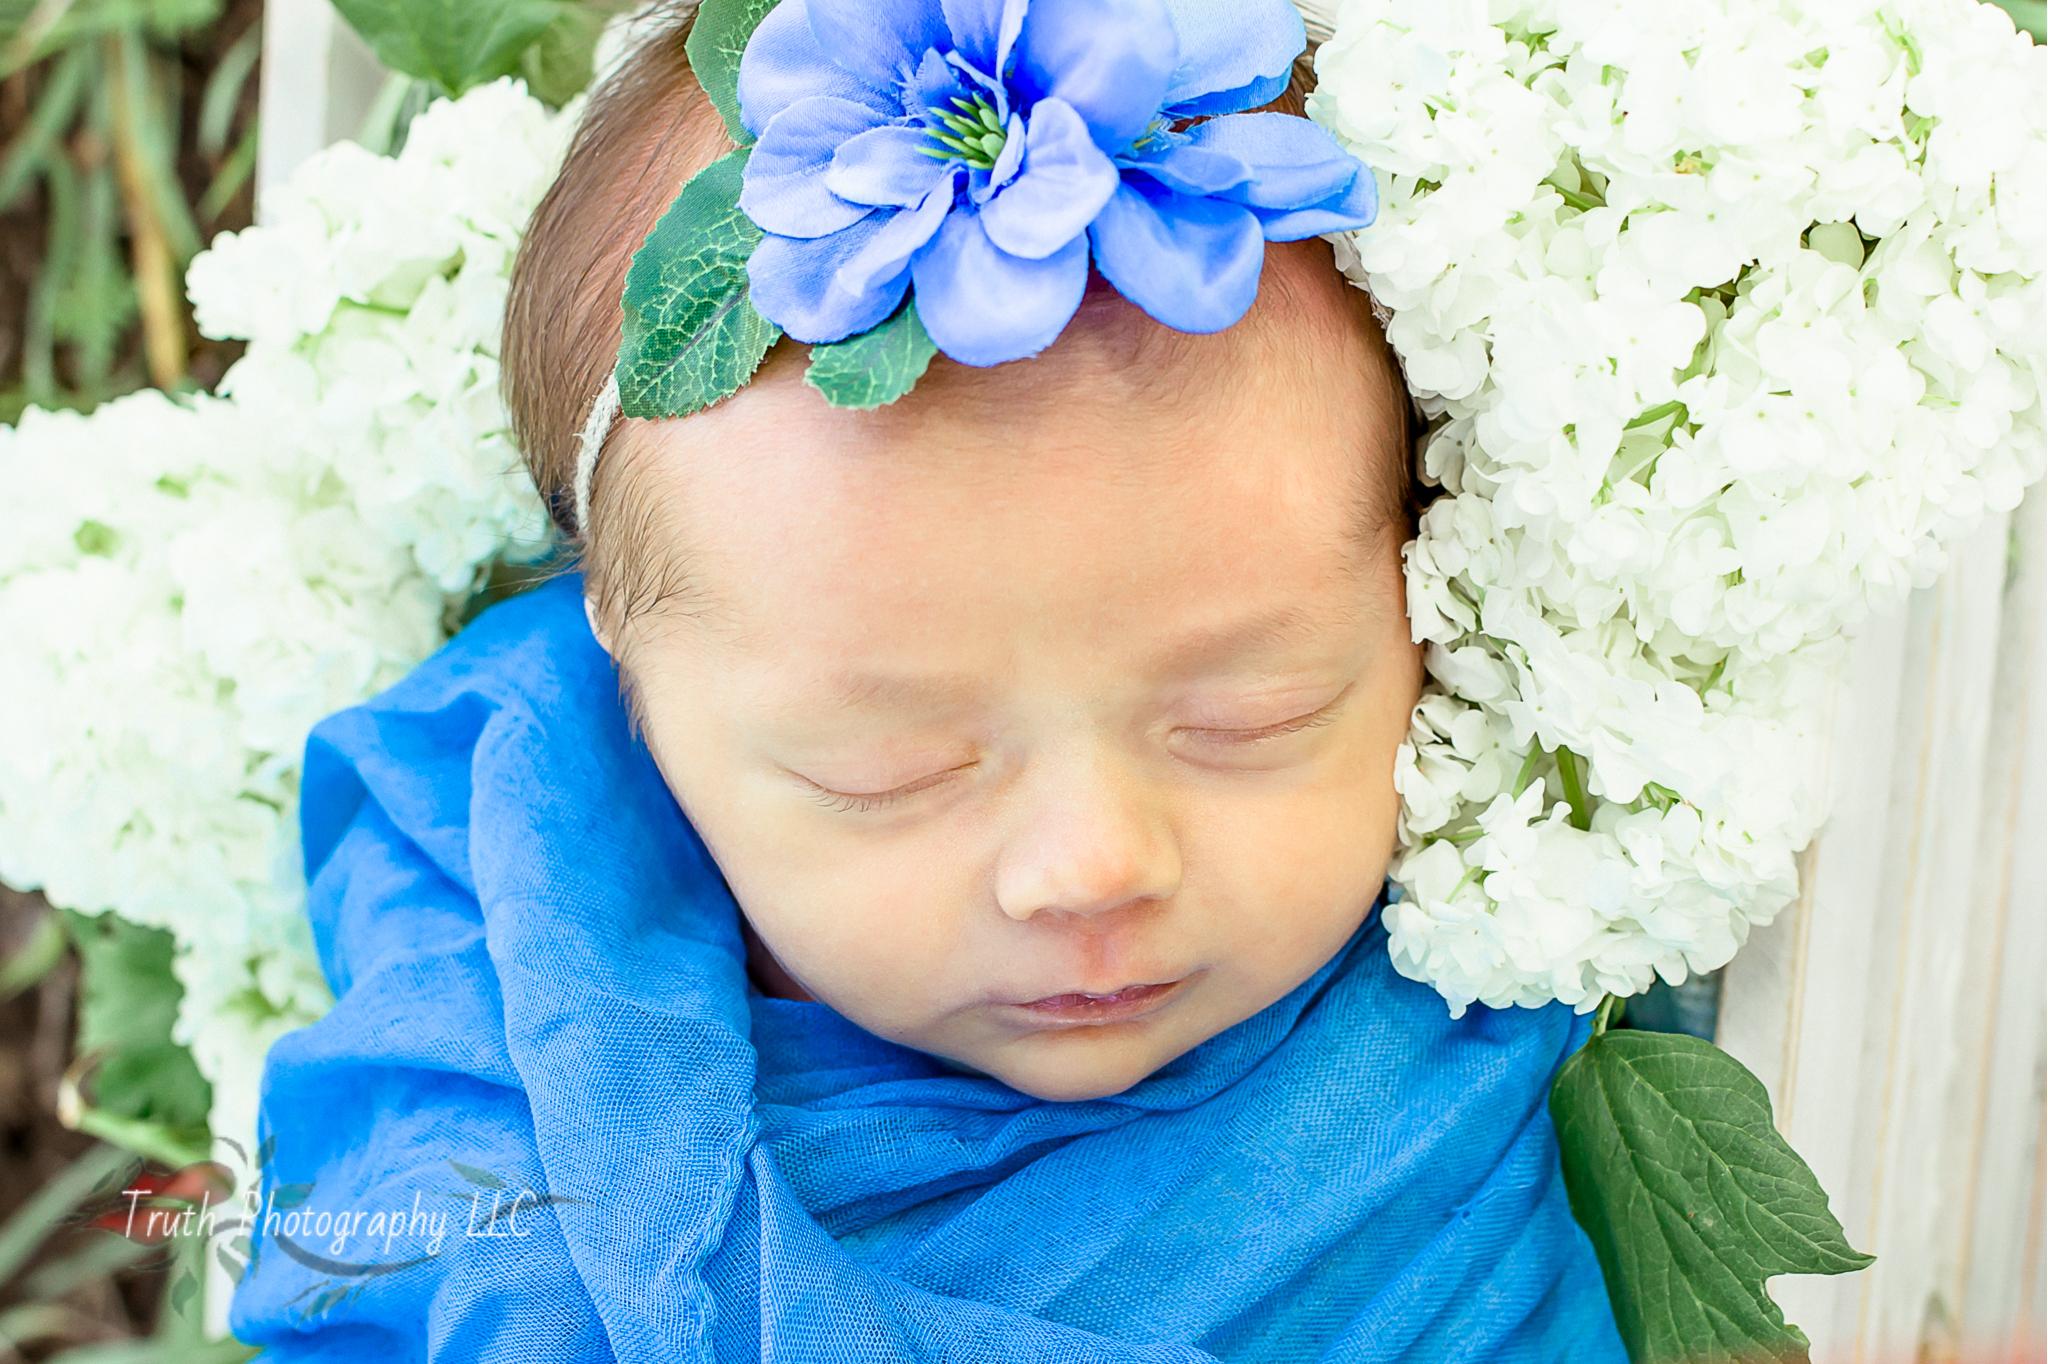 Truth-Photography-Denver-Outdoor-newborn-photograph.jpg